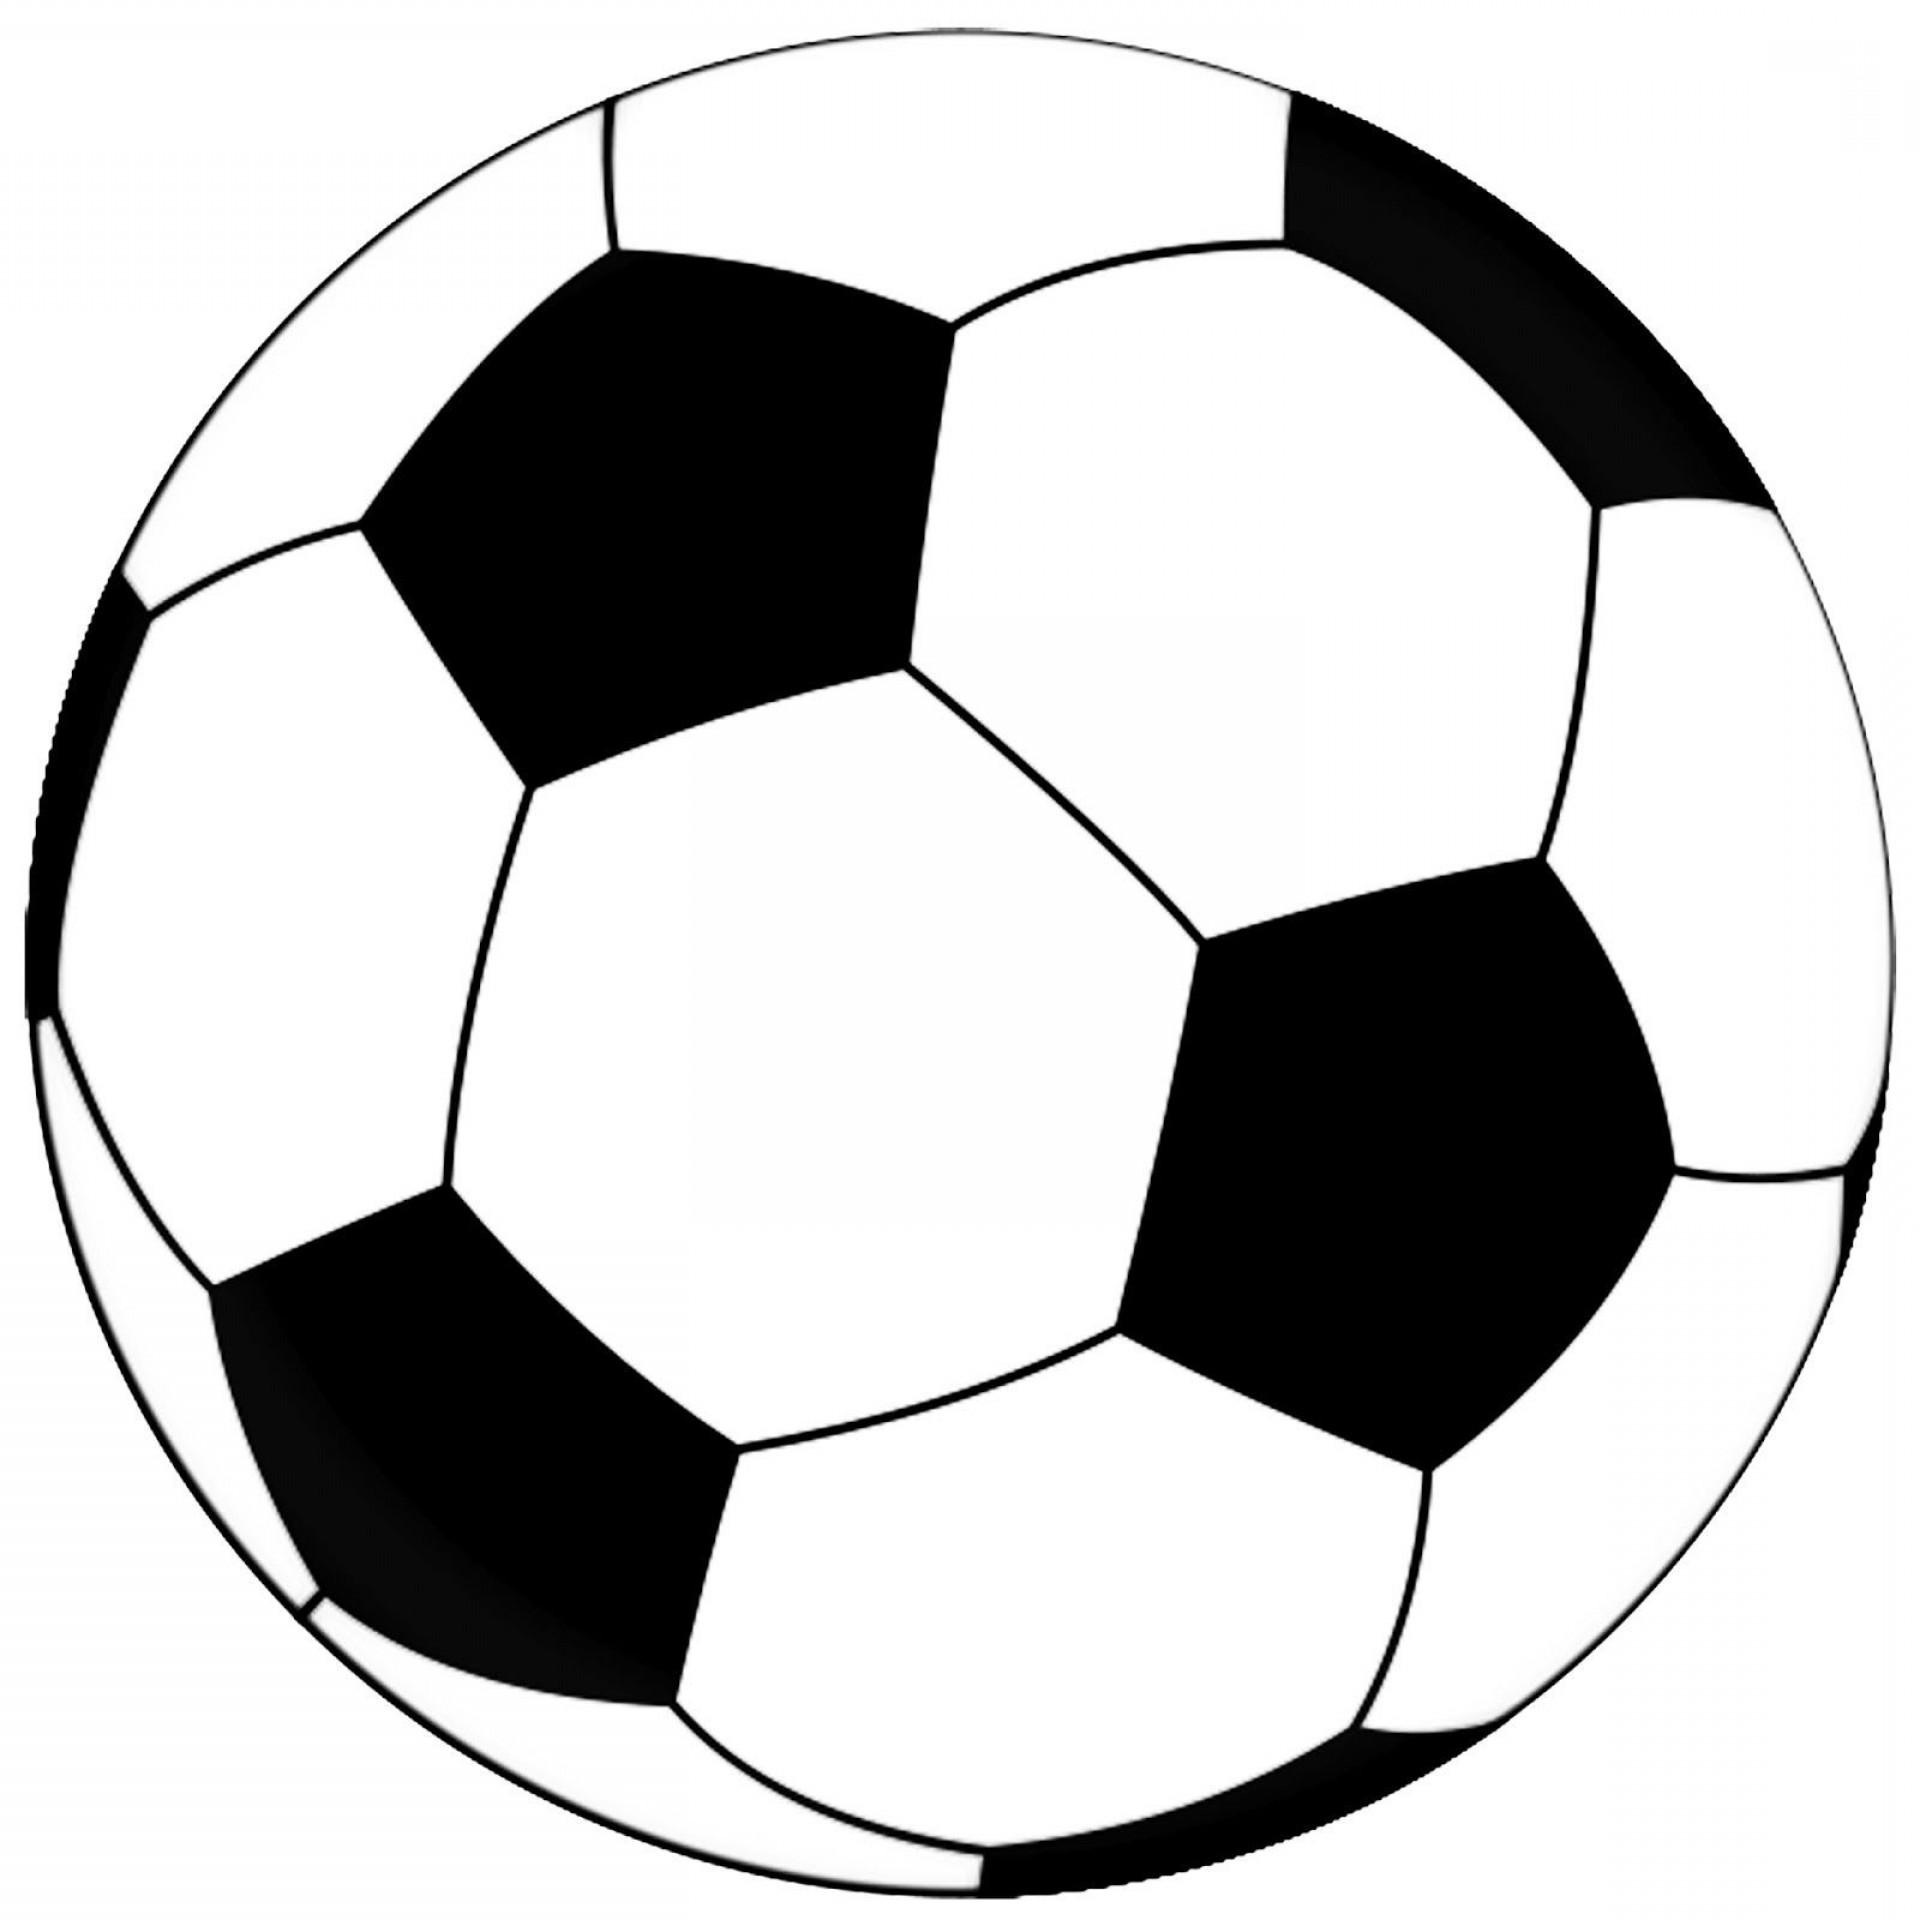 Vector Soccer Ball Vector Illustration K With Soccer Ball.